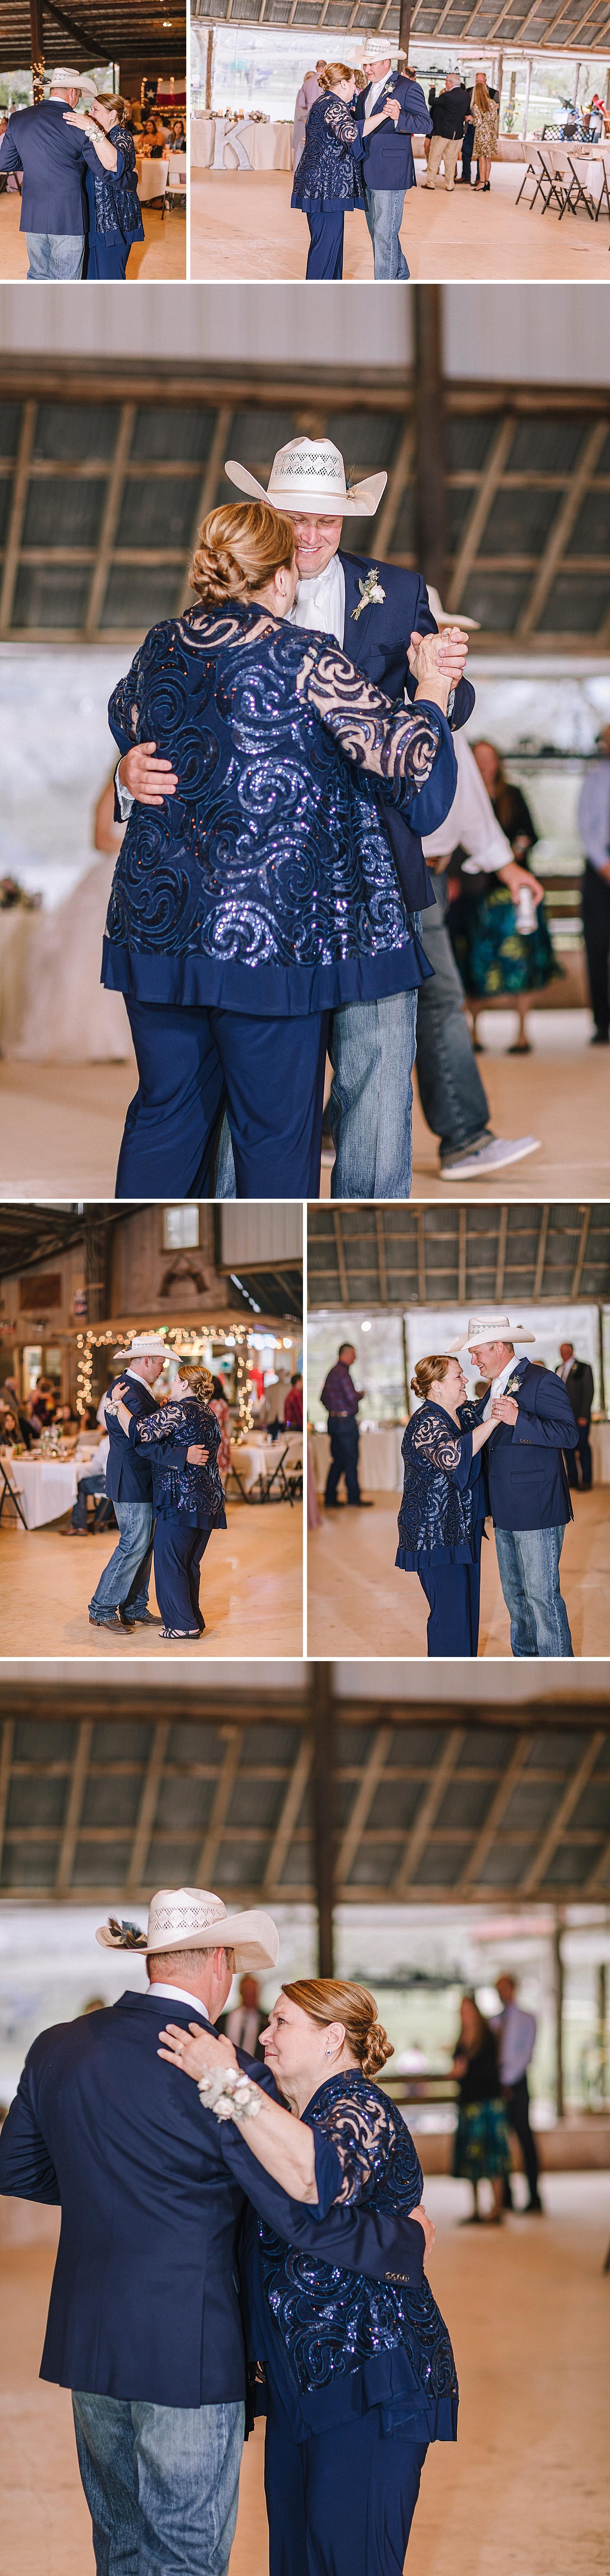 Rio-Cibilo-Ranch-Marion-Texas-Wedding-Rustic-Blush-Rose-Quartz-Details-Carly-Barton-Photography_0078.jpg